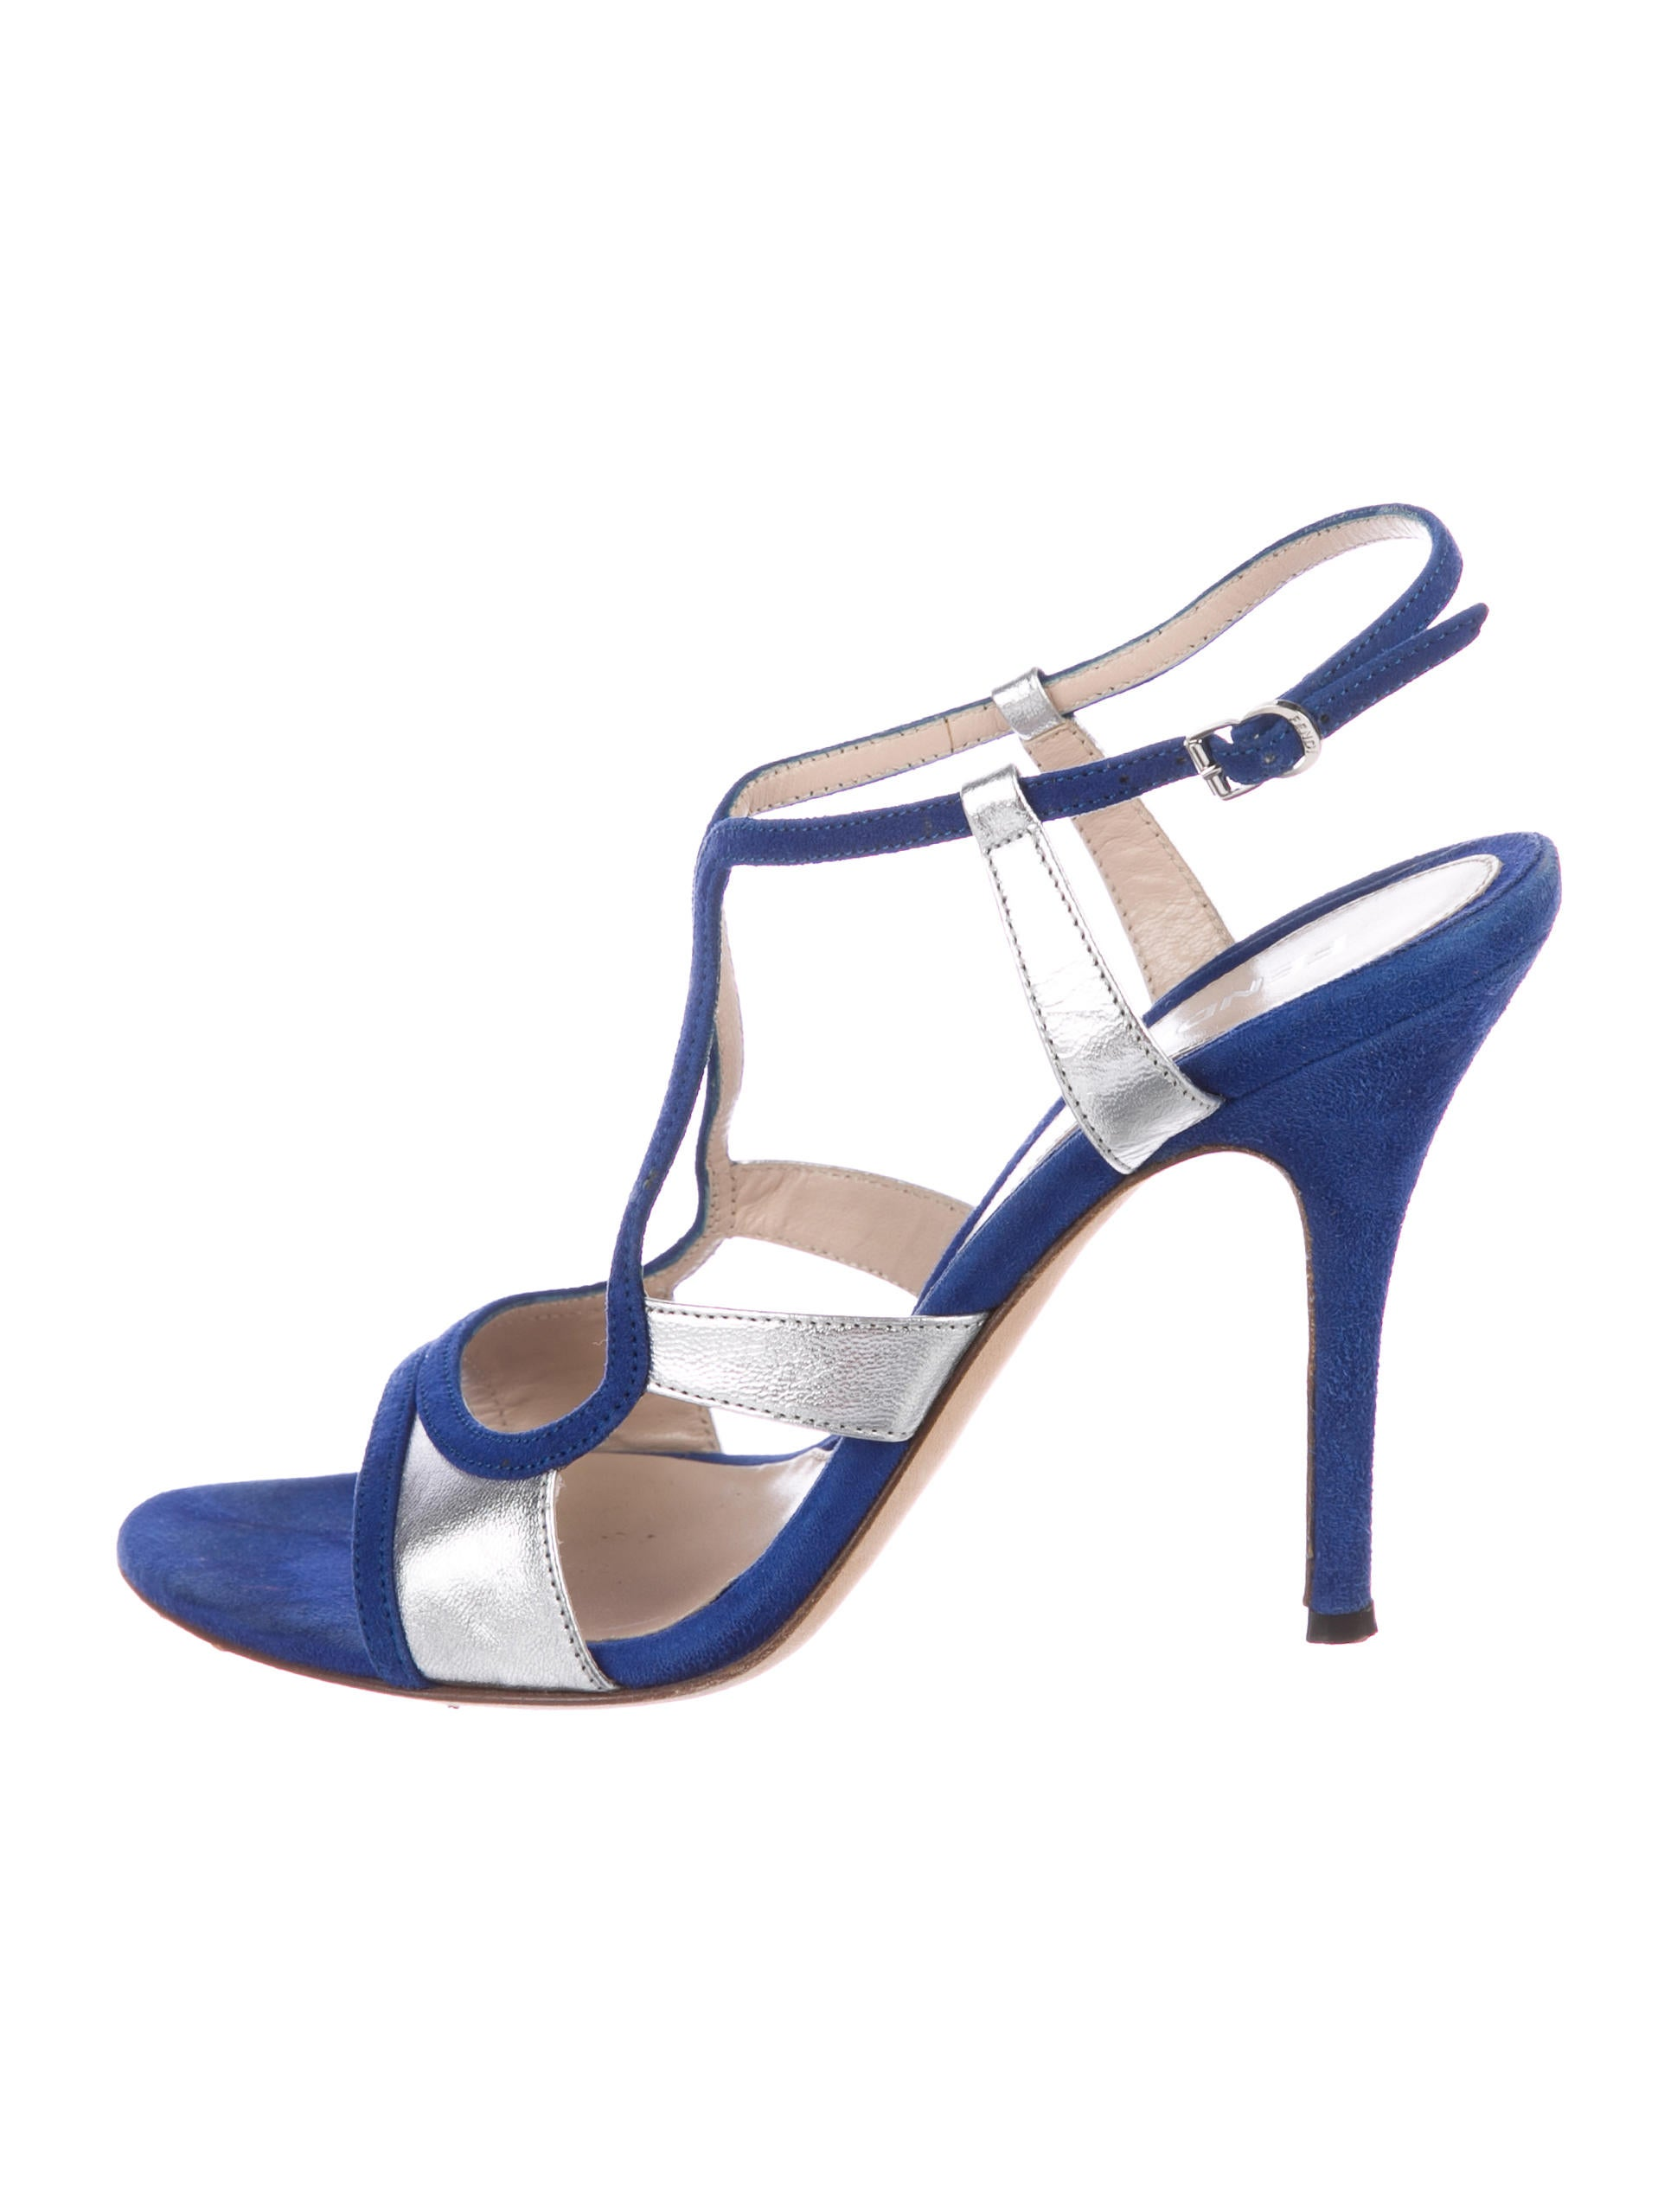 Fendi Suede Multistrap Sandals amazon online qENcM